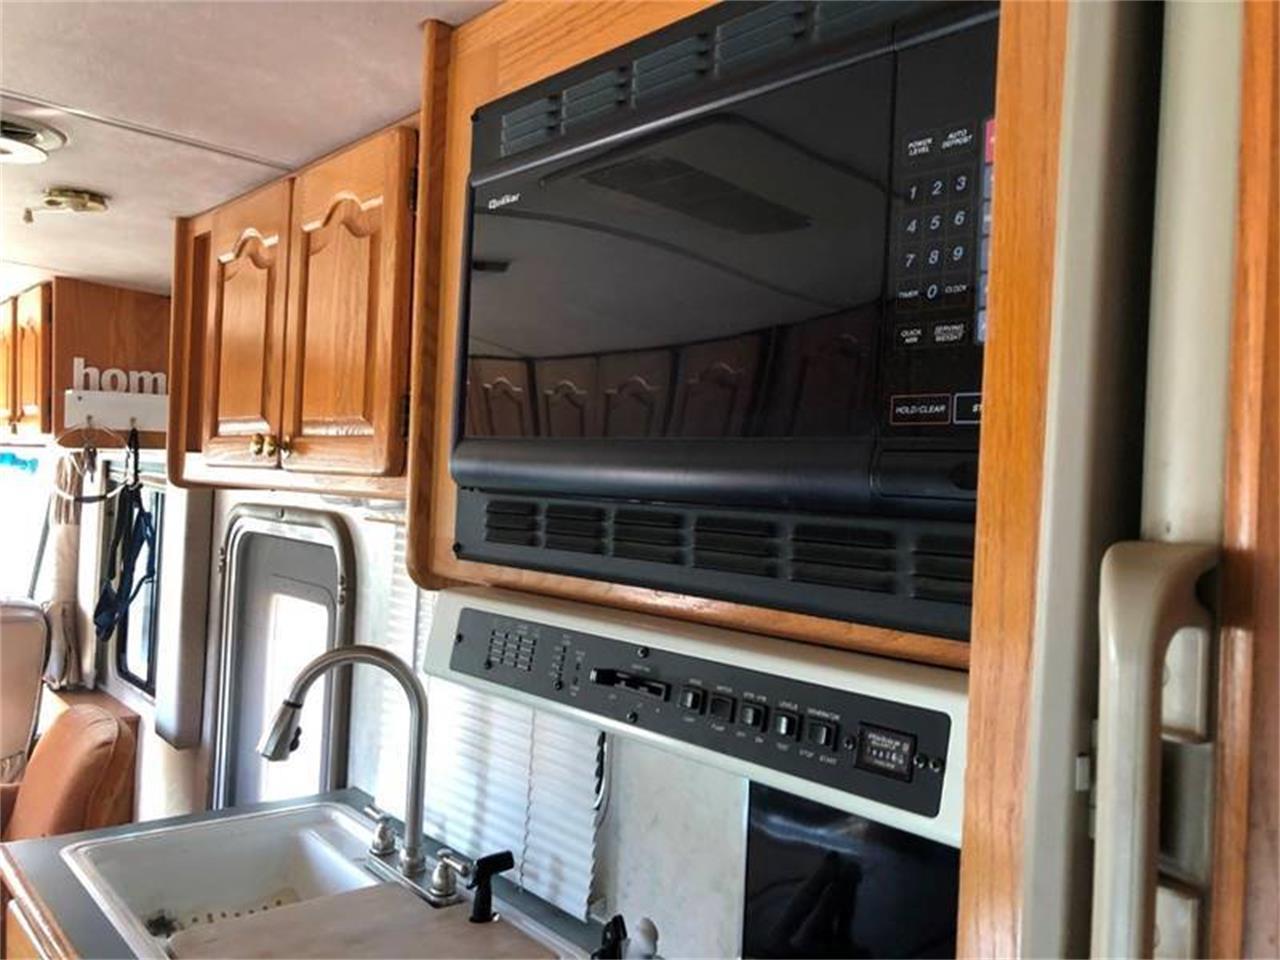 1994 Miscellaneous Recreational Vehicle (CC-1387256) for sale in Brea, California